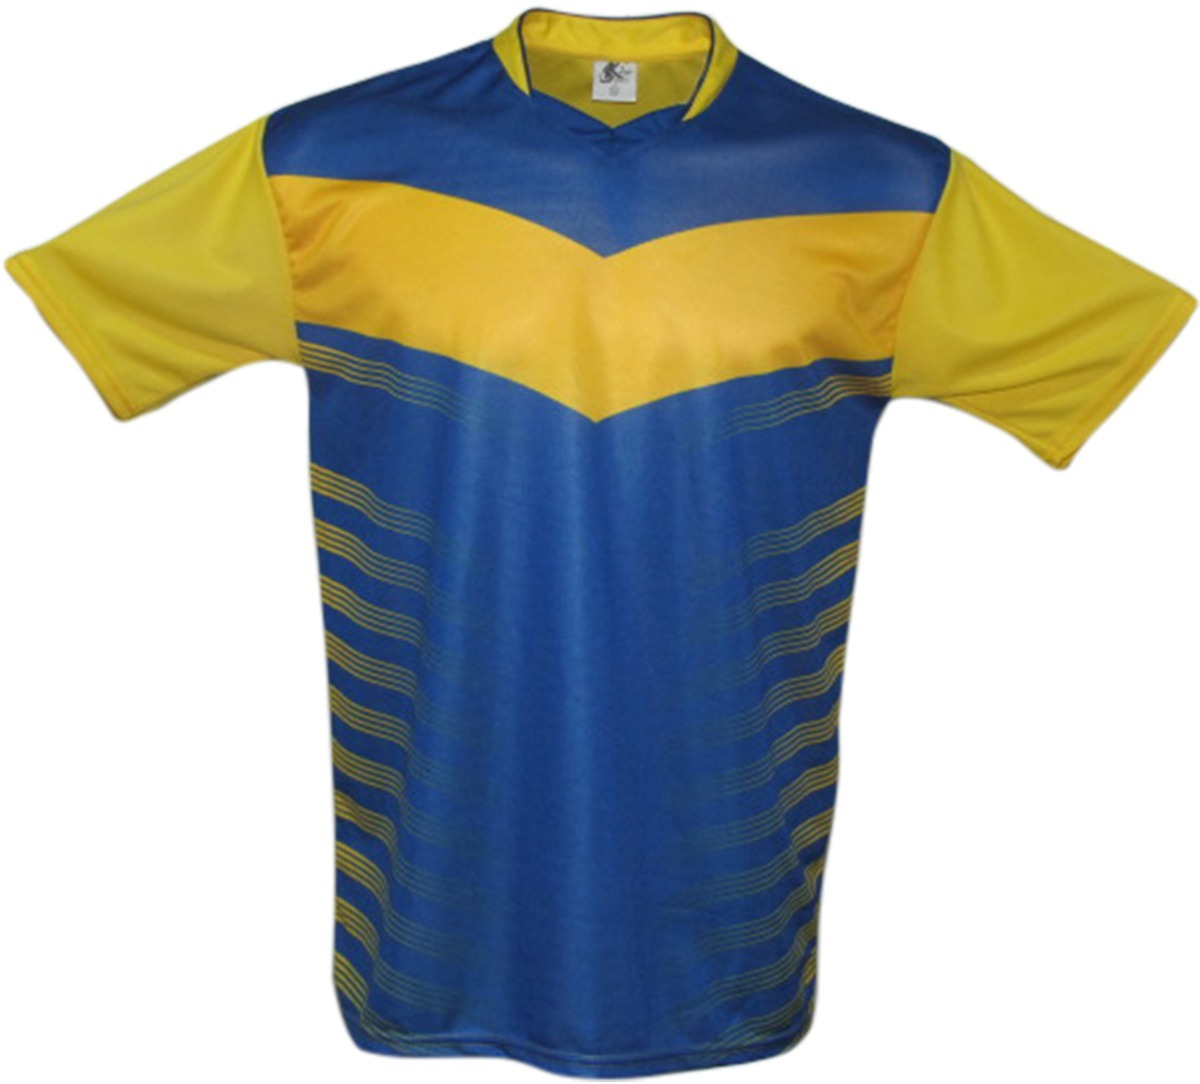 Kit 5 Camisa Numerada Futebol Fardamento Uniforme Esportivo - R  140 ... ef42bac41d978